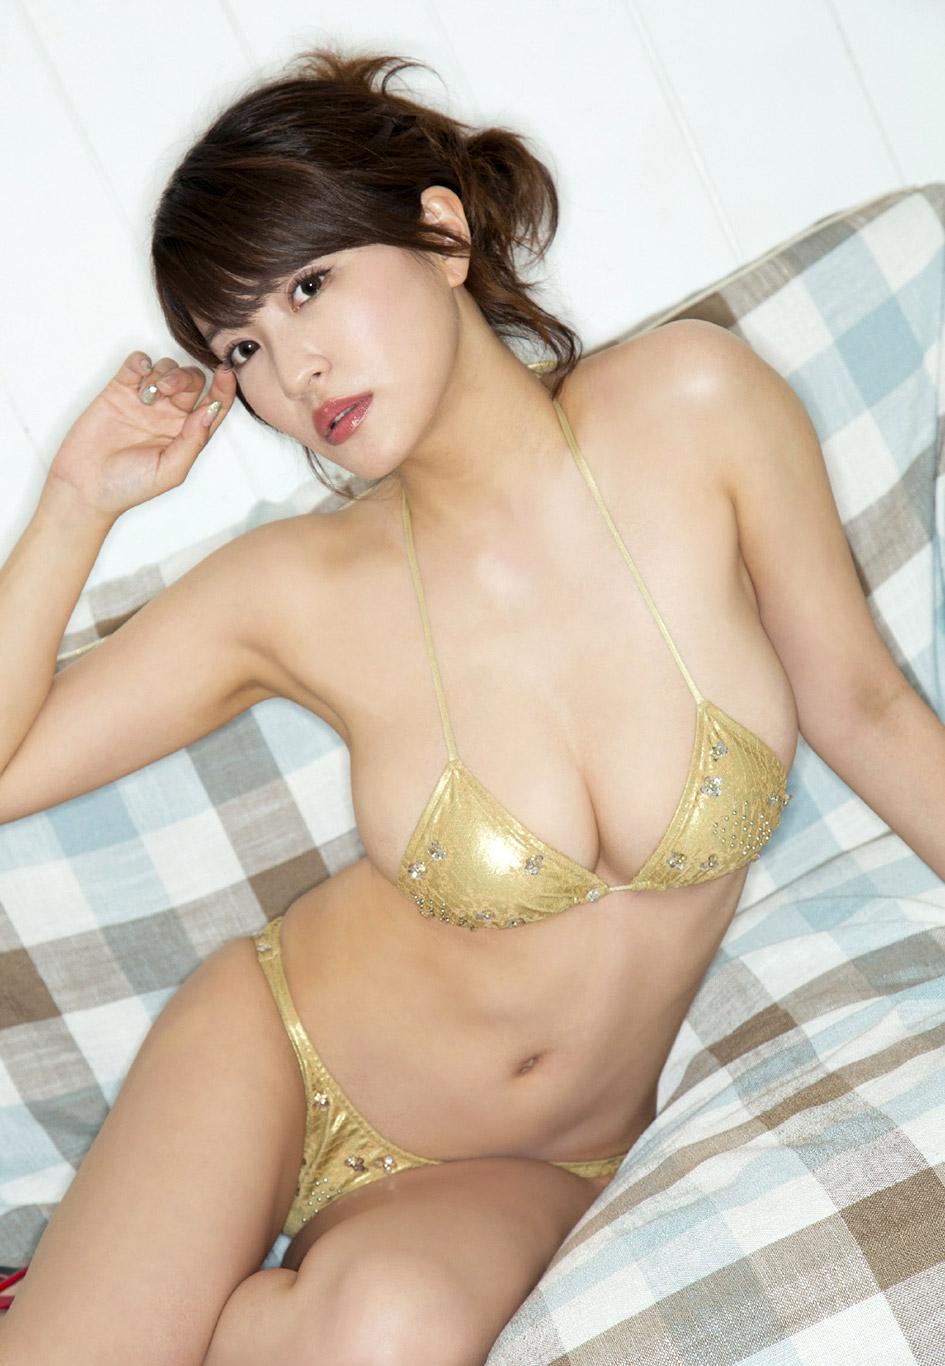 Asuka Kishi Porn asiauncensored japan sex asuka kishi 岸明日香 pics 117!